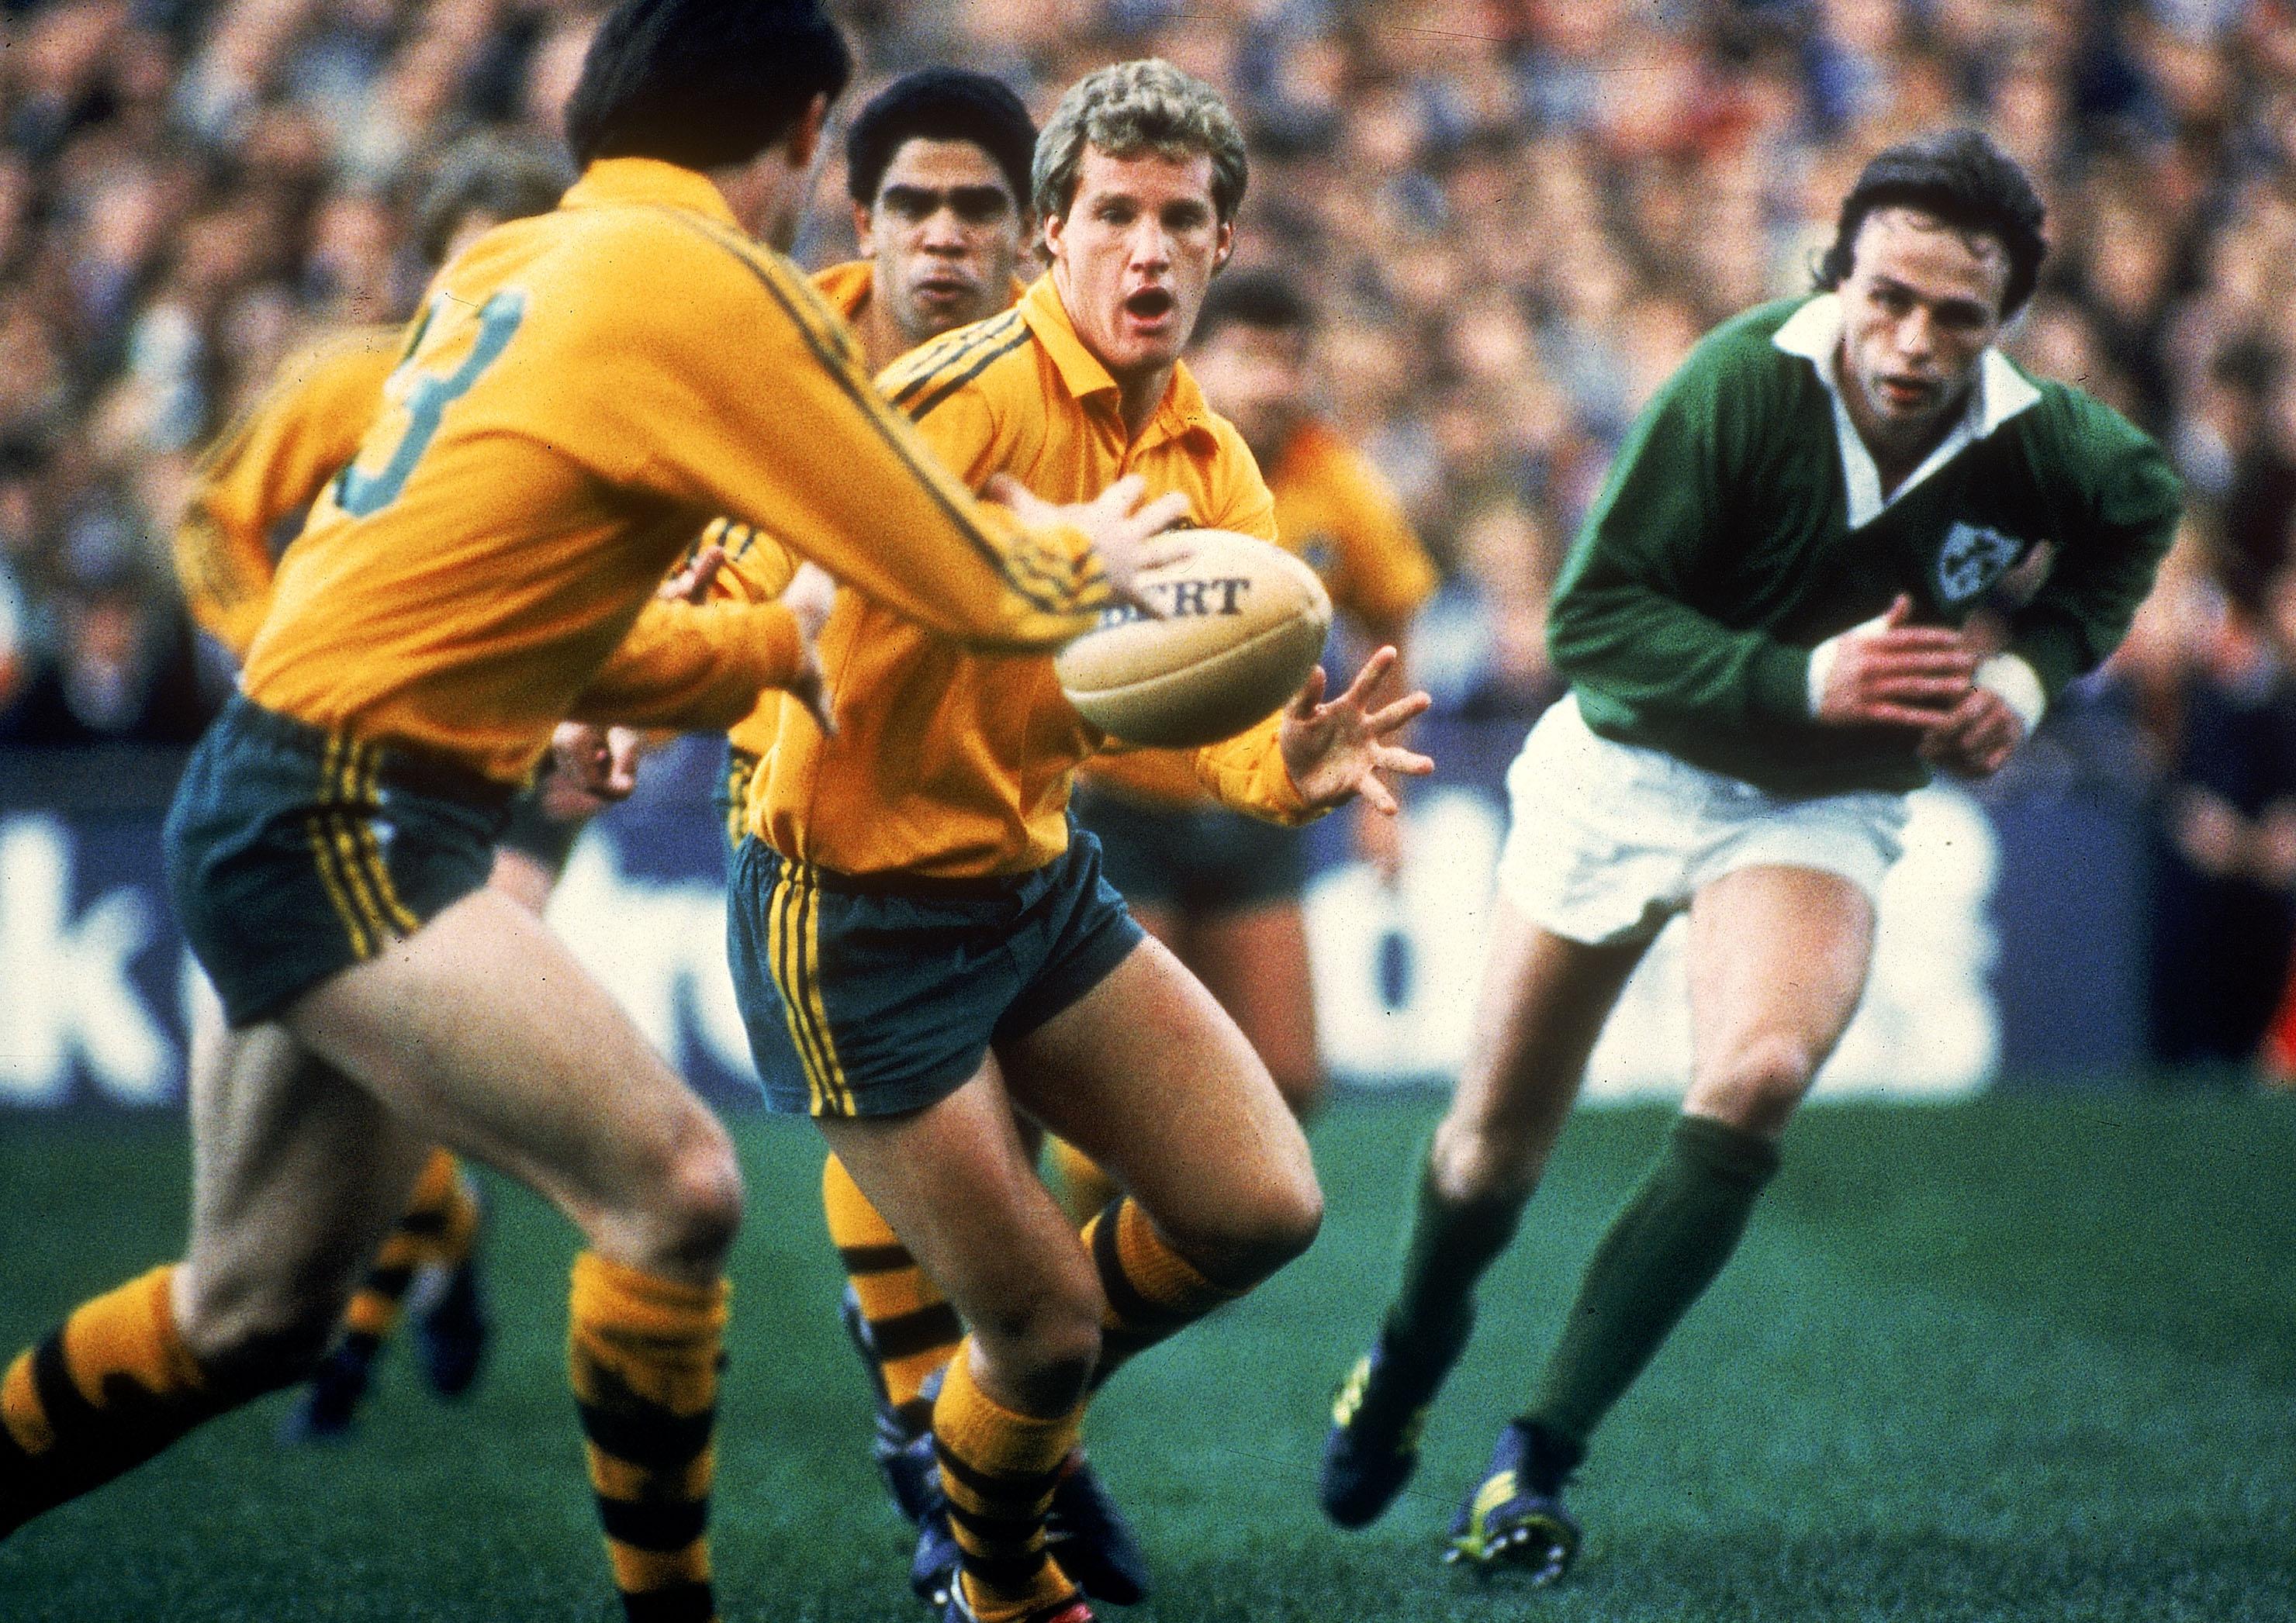 Rugby Union - Ireland v Australia